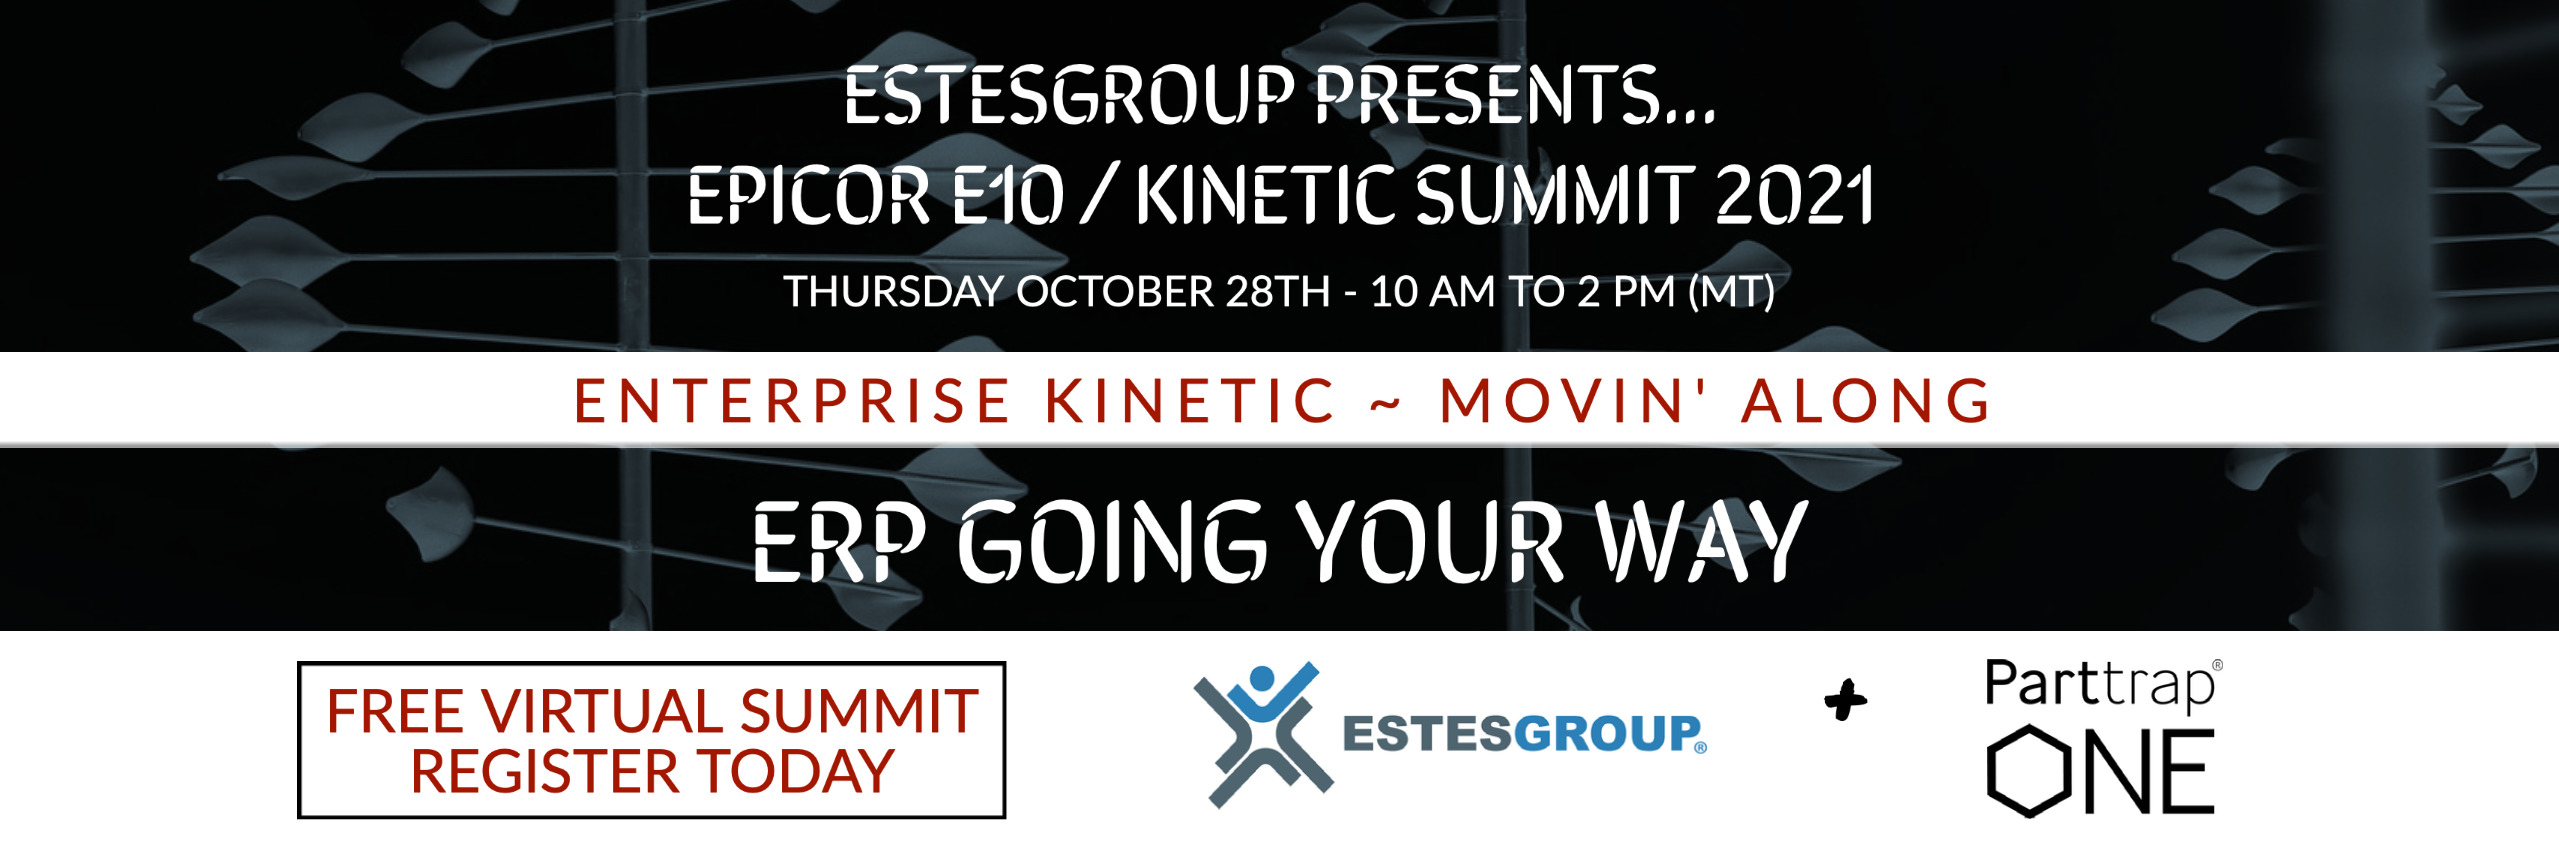 Epicor Kinetic User Summit Fall 2021